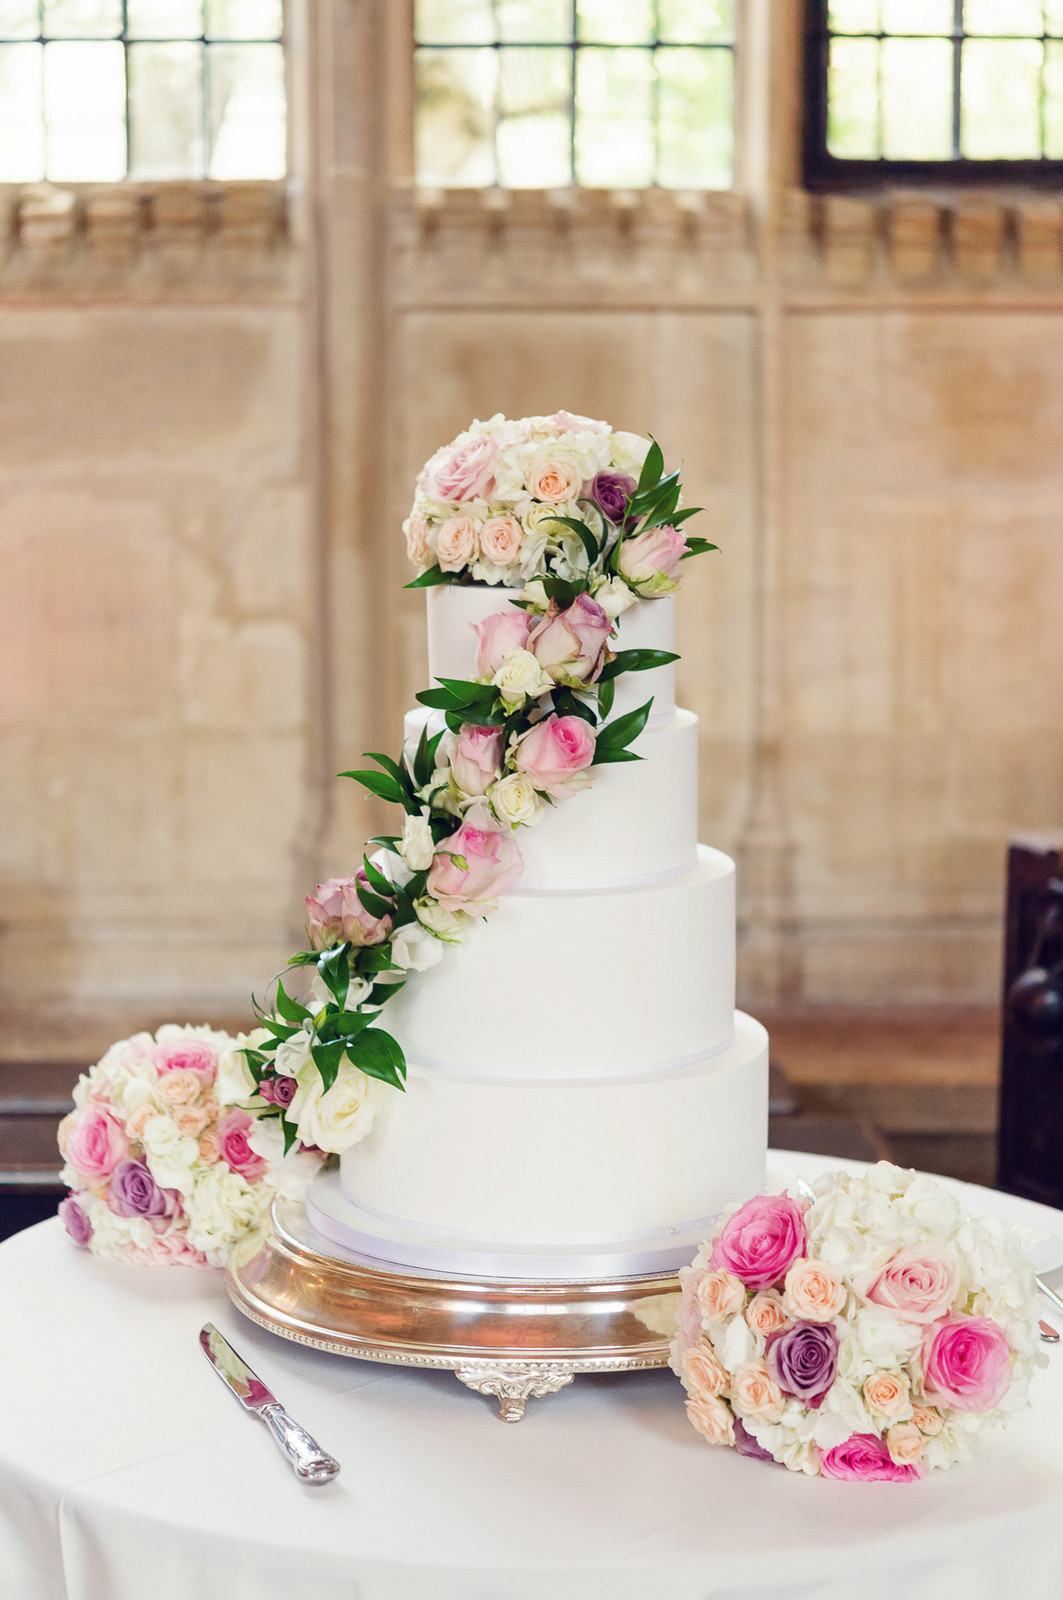 Princess Patisserie | Bespoke Wedding Cakes & Dessert ...